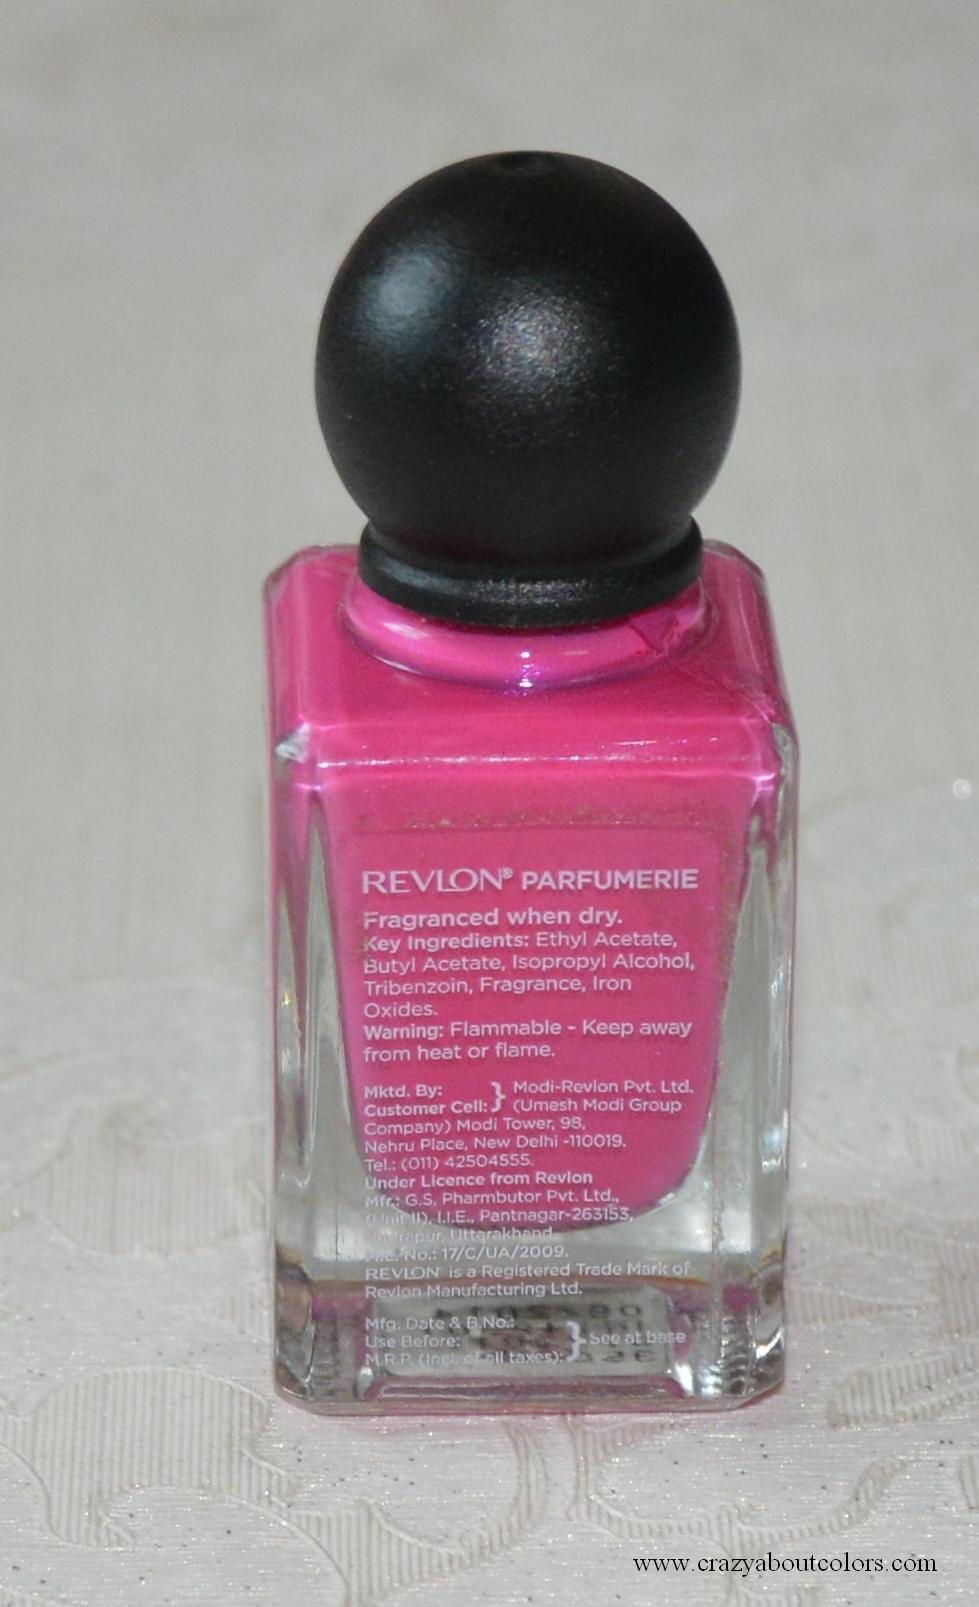 Revlon Parfumerie Scented Nail Enamel African Tea Rose: Review